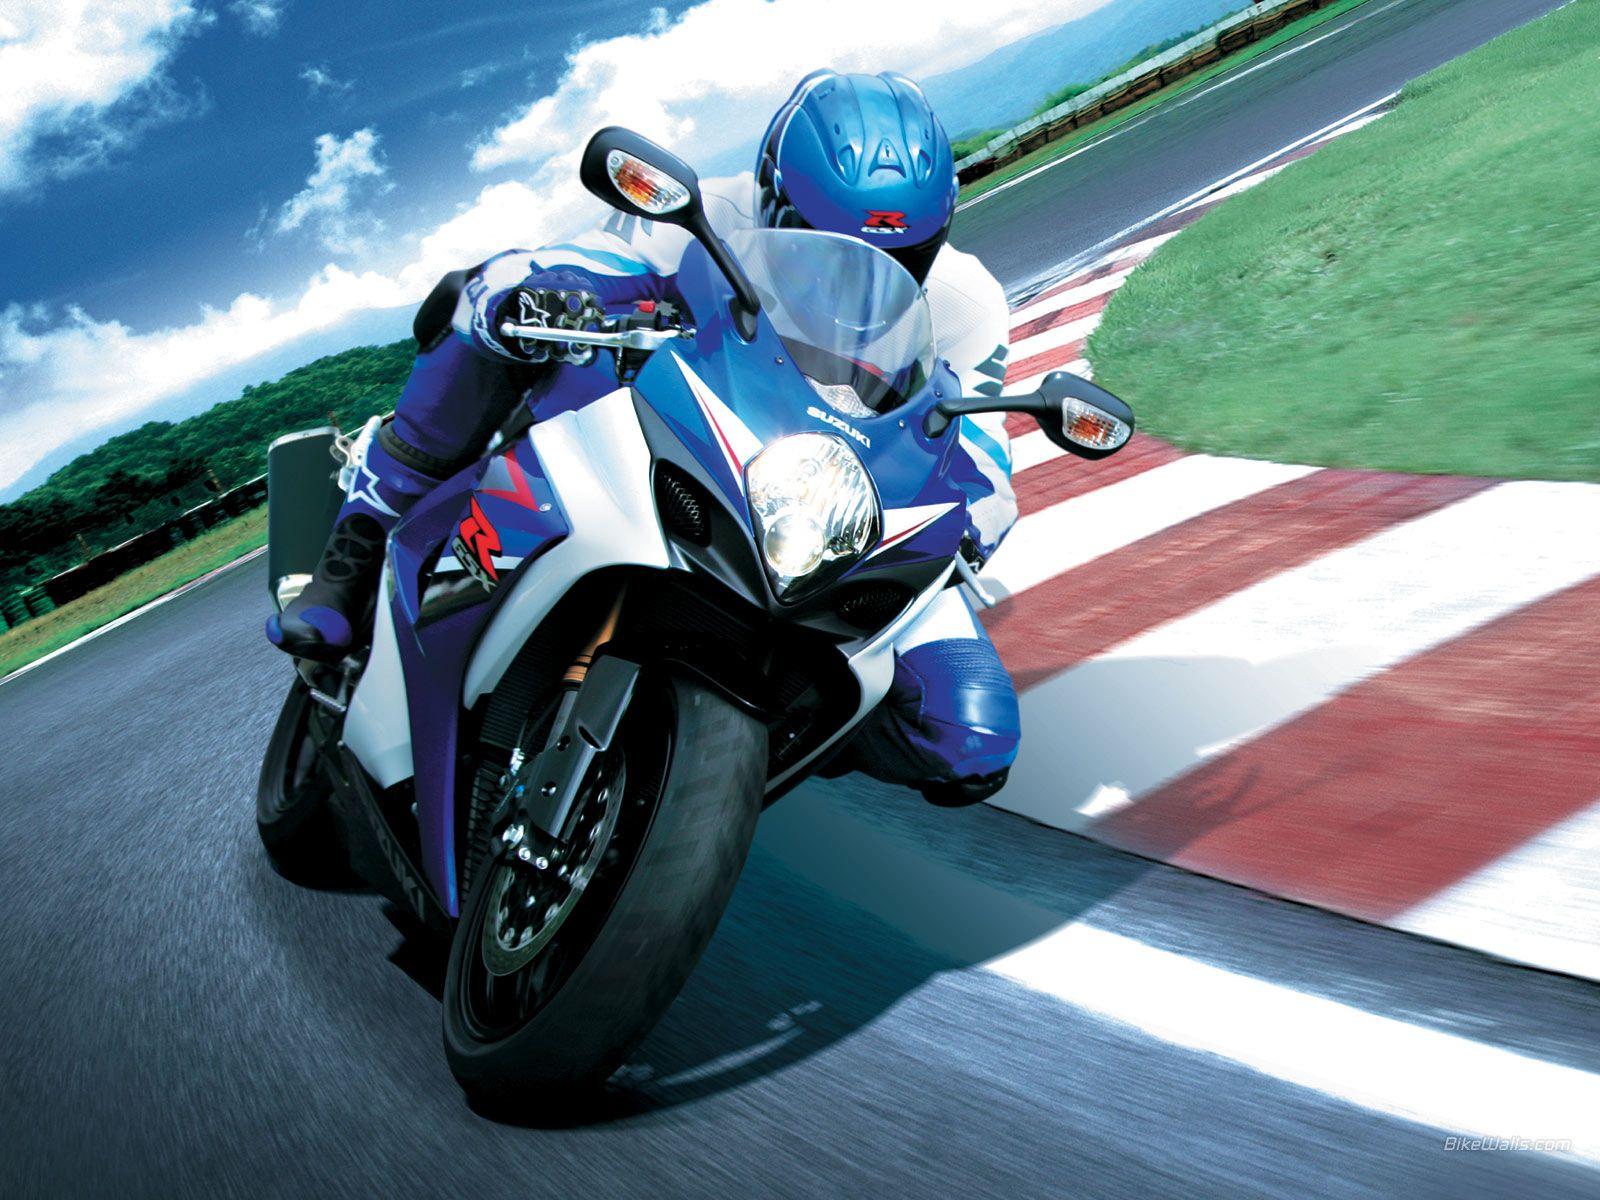 Free Download Suzuki Moto Gp Wallpapers Hd Wallpapers 1600x1200 For Your Desktop Mobile Tablet Explore 48 Motogp Wallpaper Hd Motogp Wallpaper Motogp Wallpaper Widescreen Download Free Motogp Wallpaper